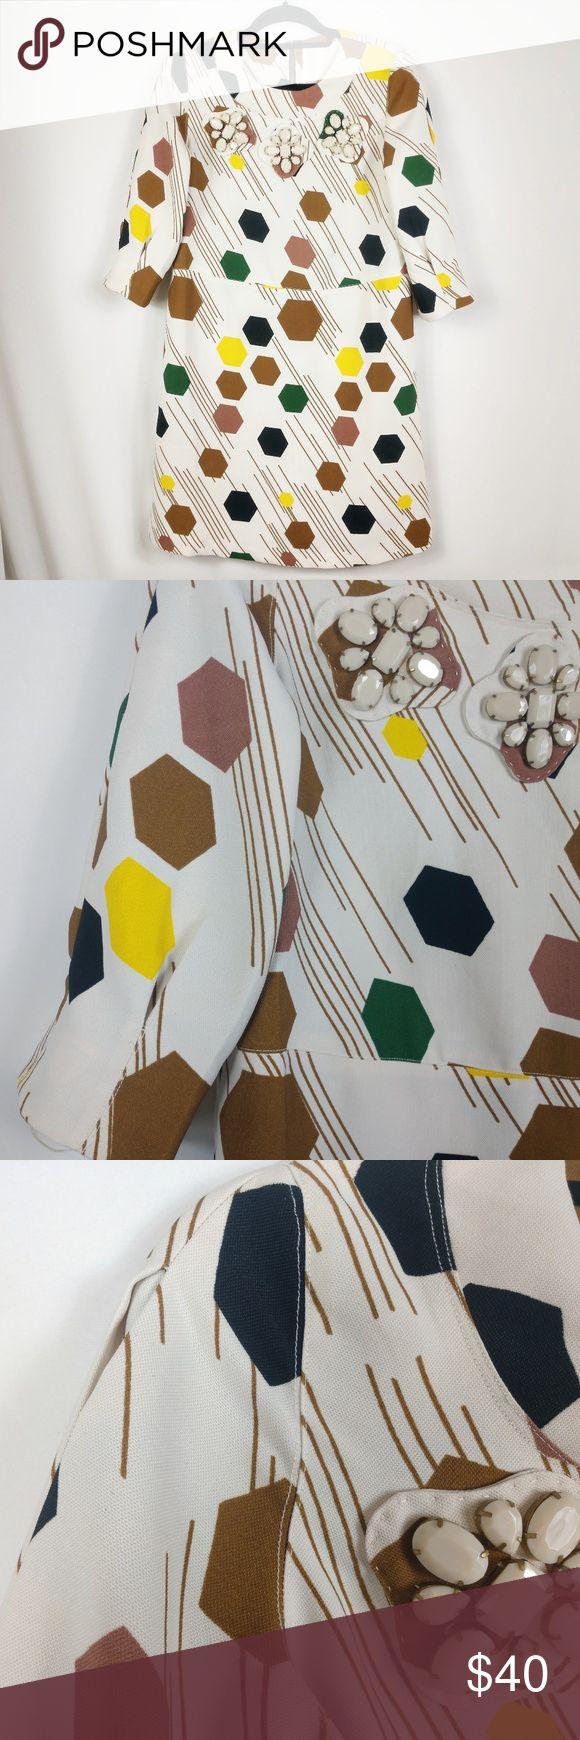 Karta Vintage Style Shift Dress Geometric Print ▪️Zip back closure ▪️Exc…